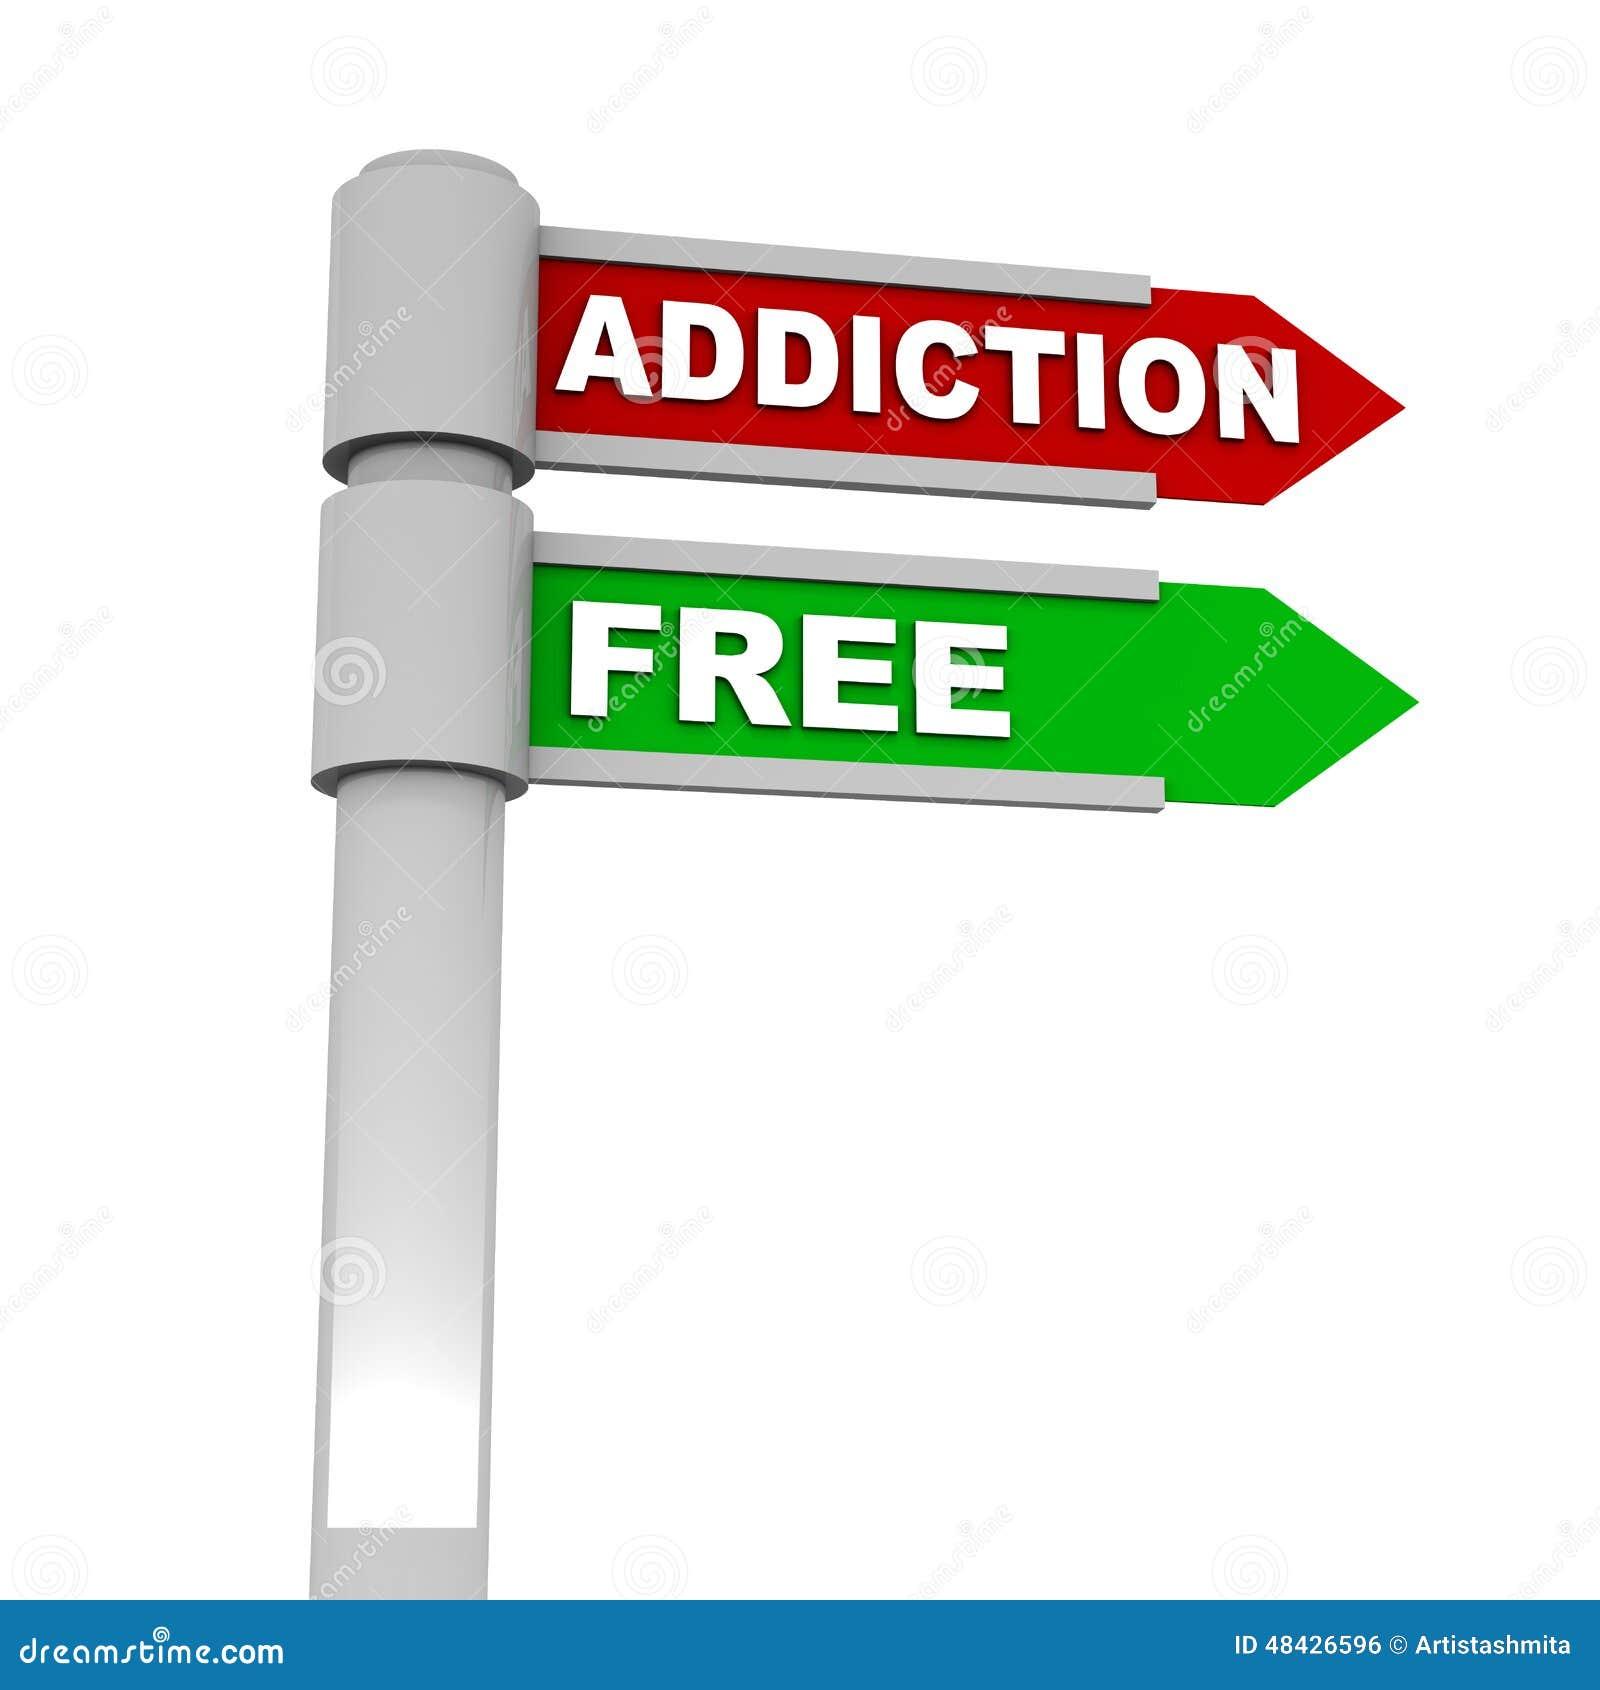 Addiction free stock illustration  Illustration of label